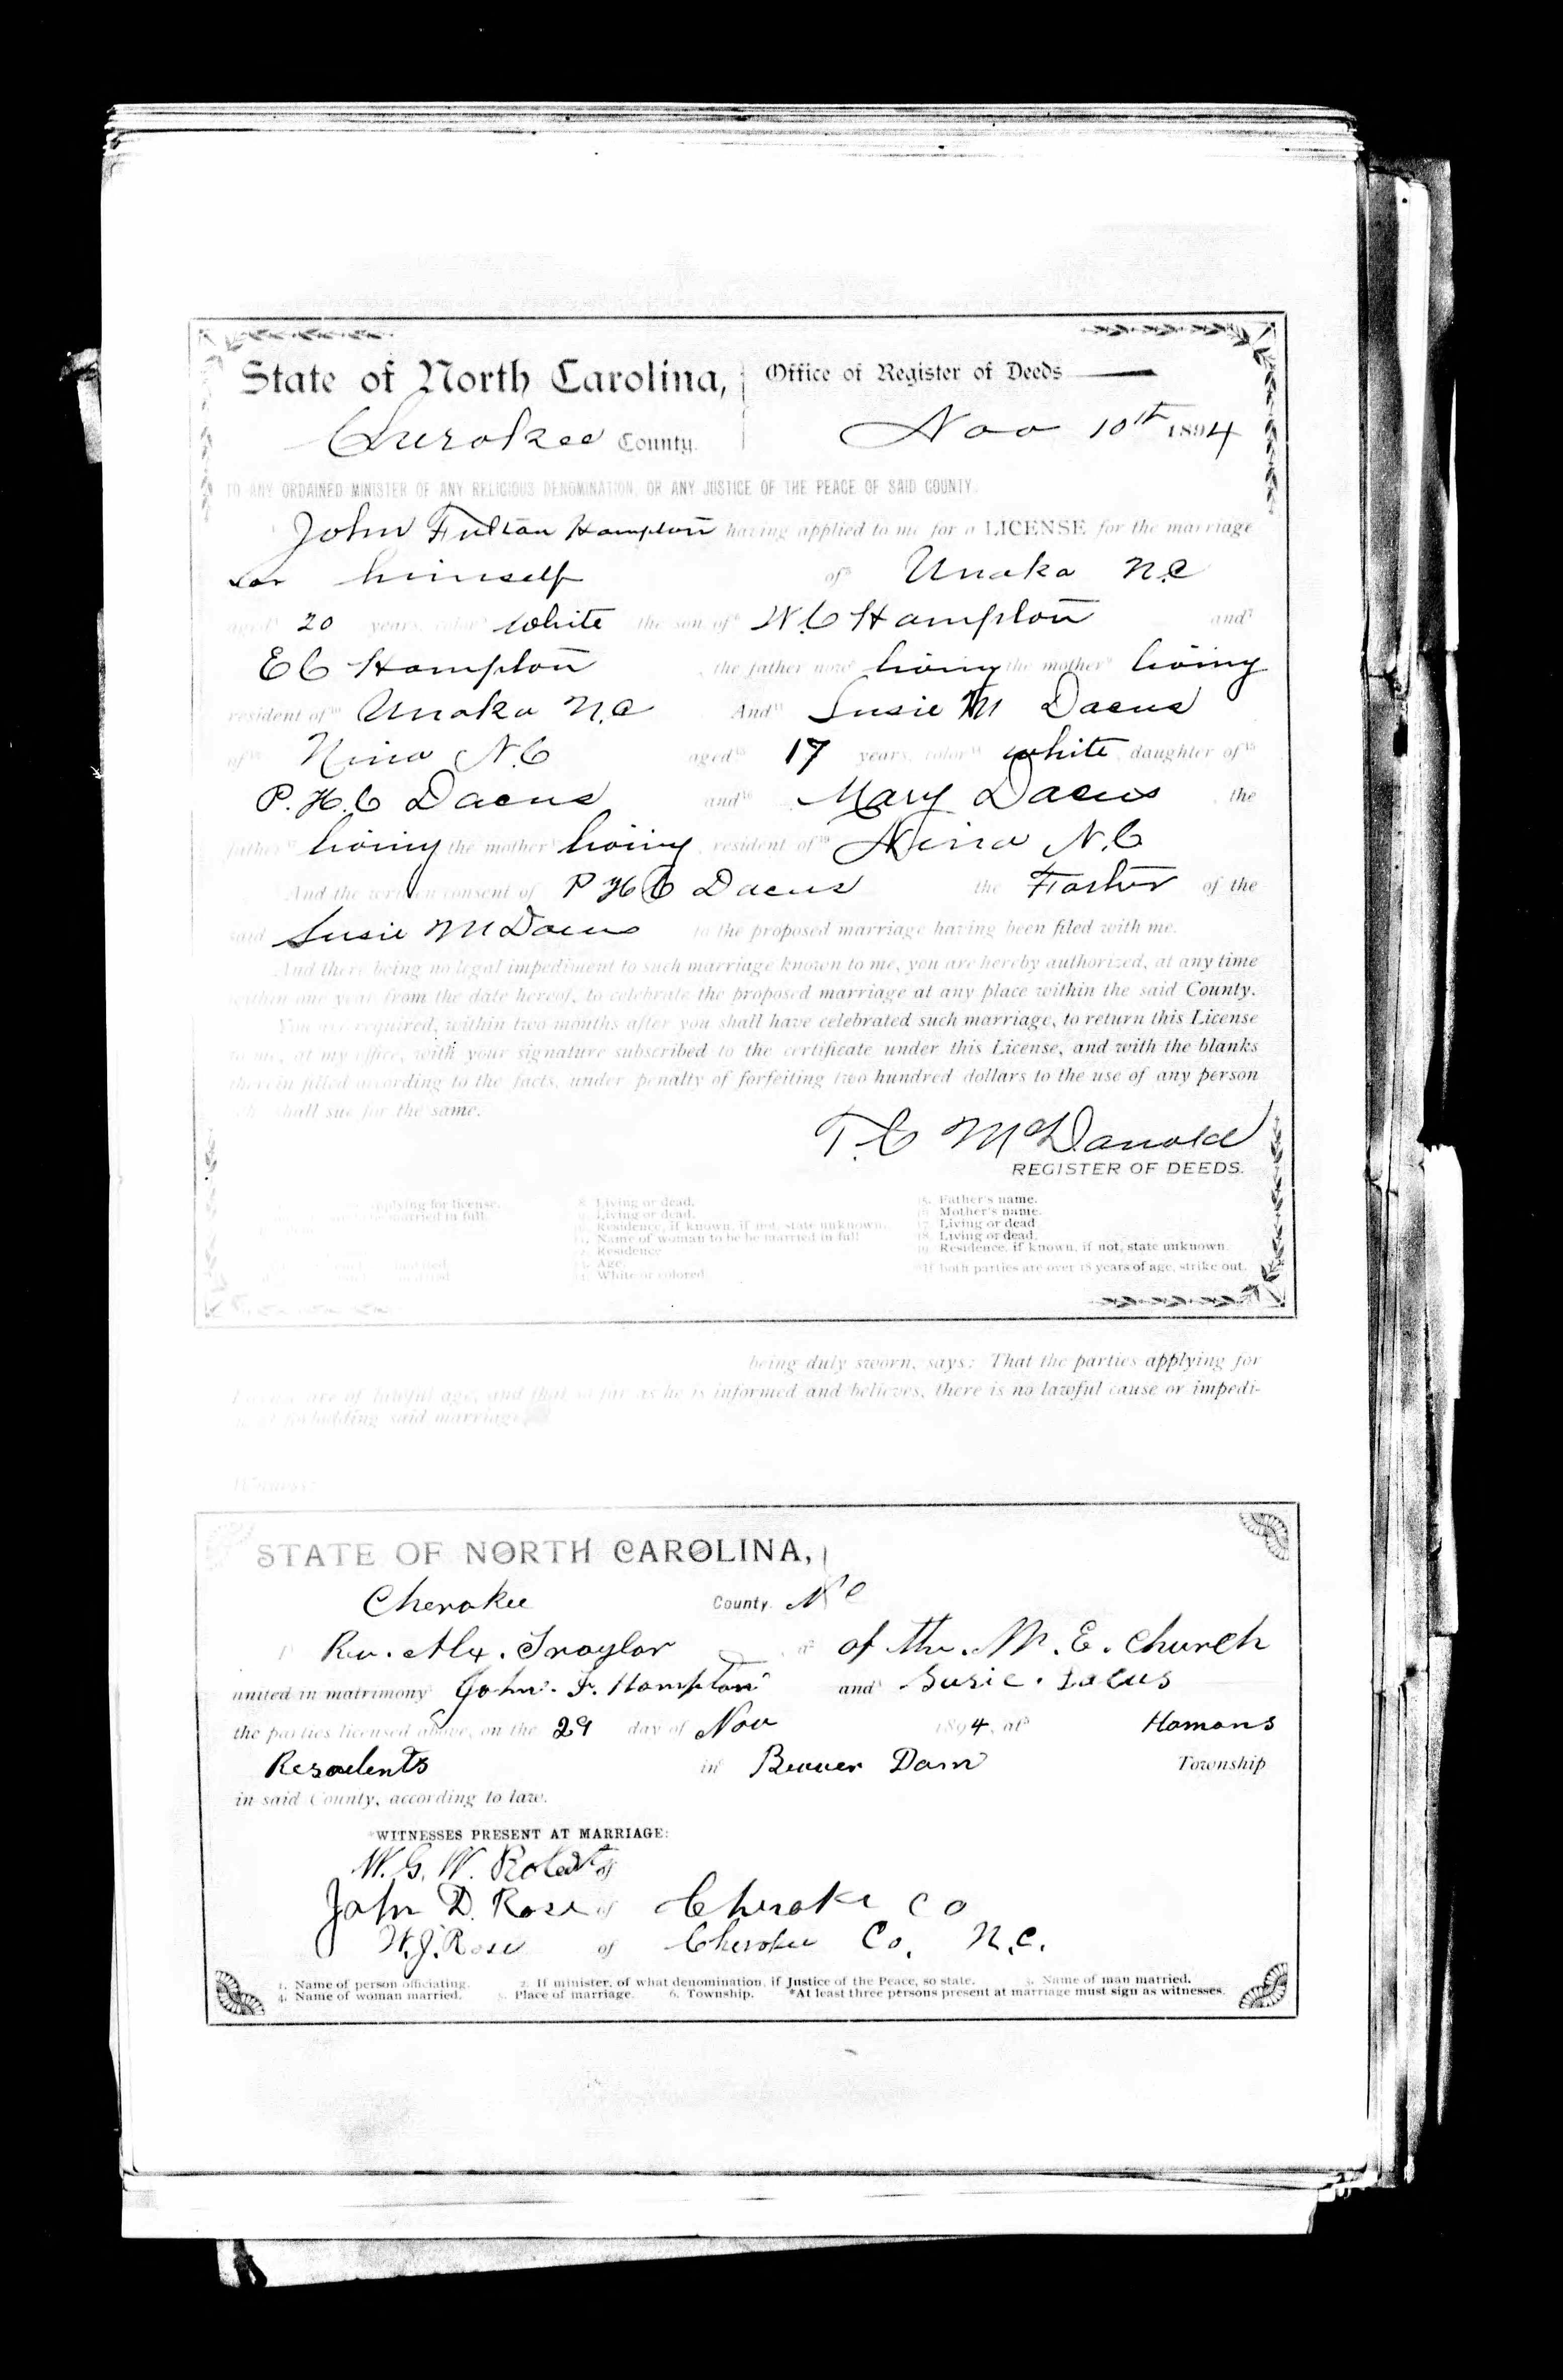 John Fulton Hampton discovered in North Carolina, Marriage